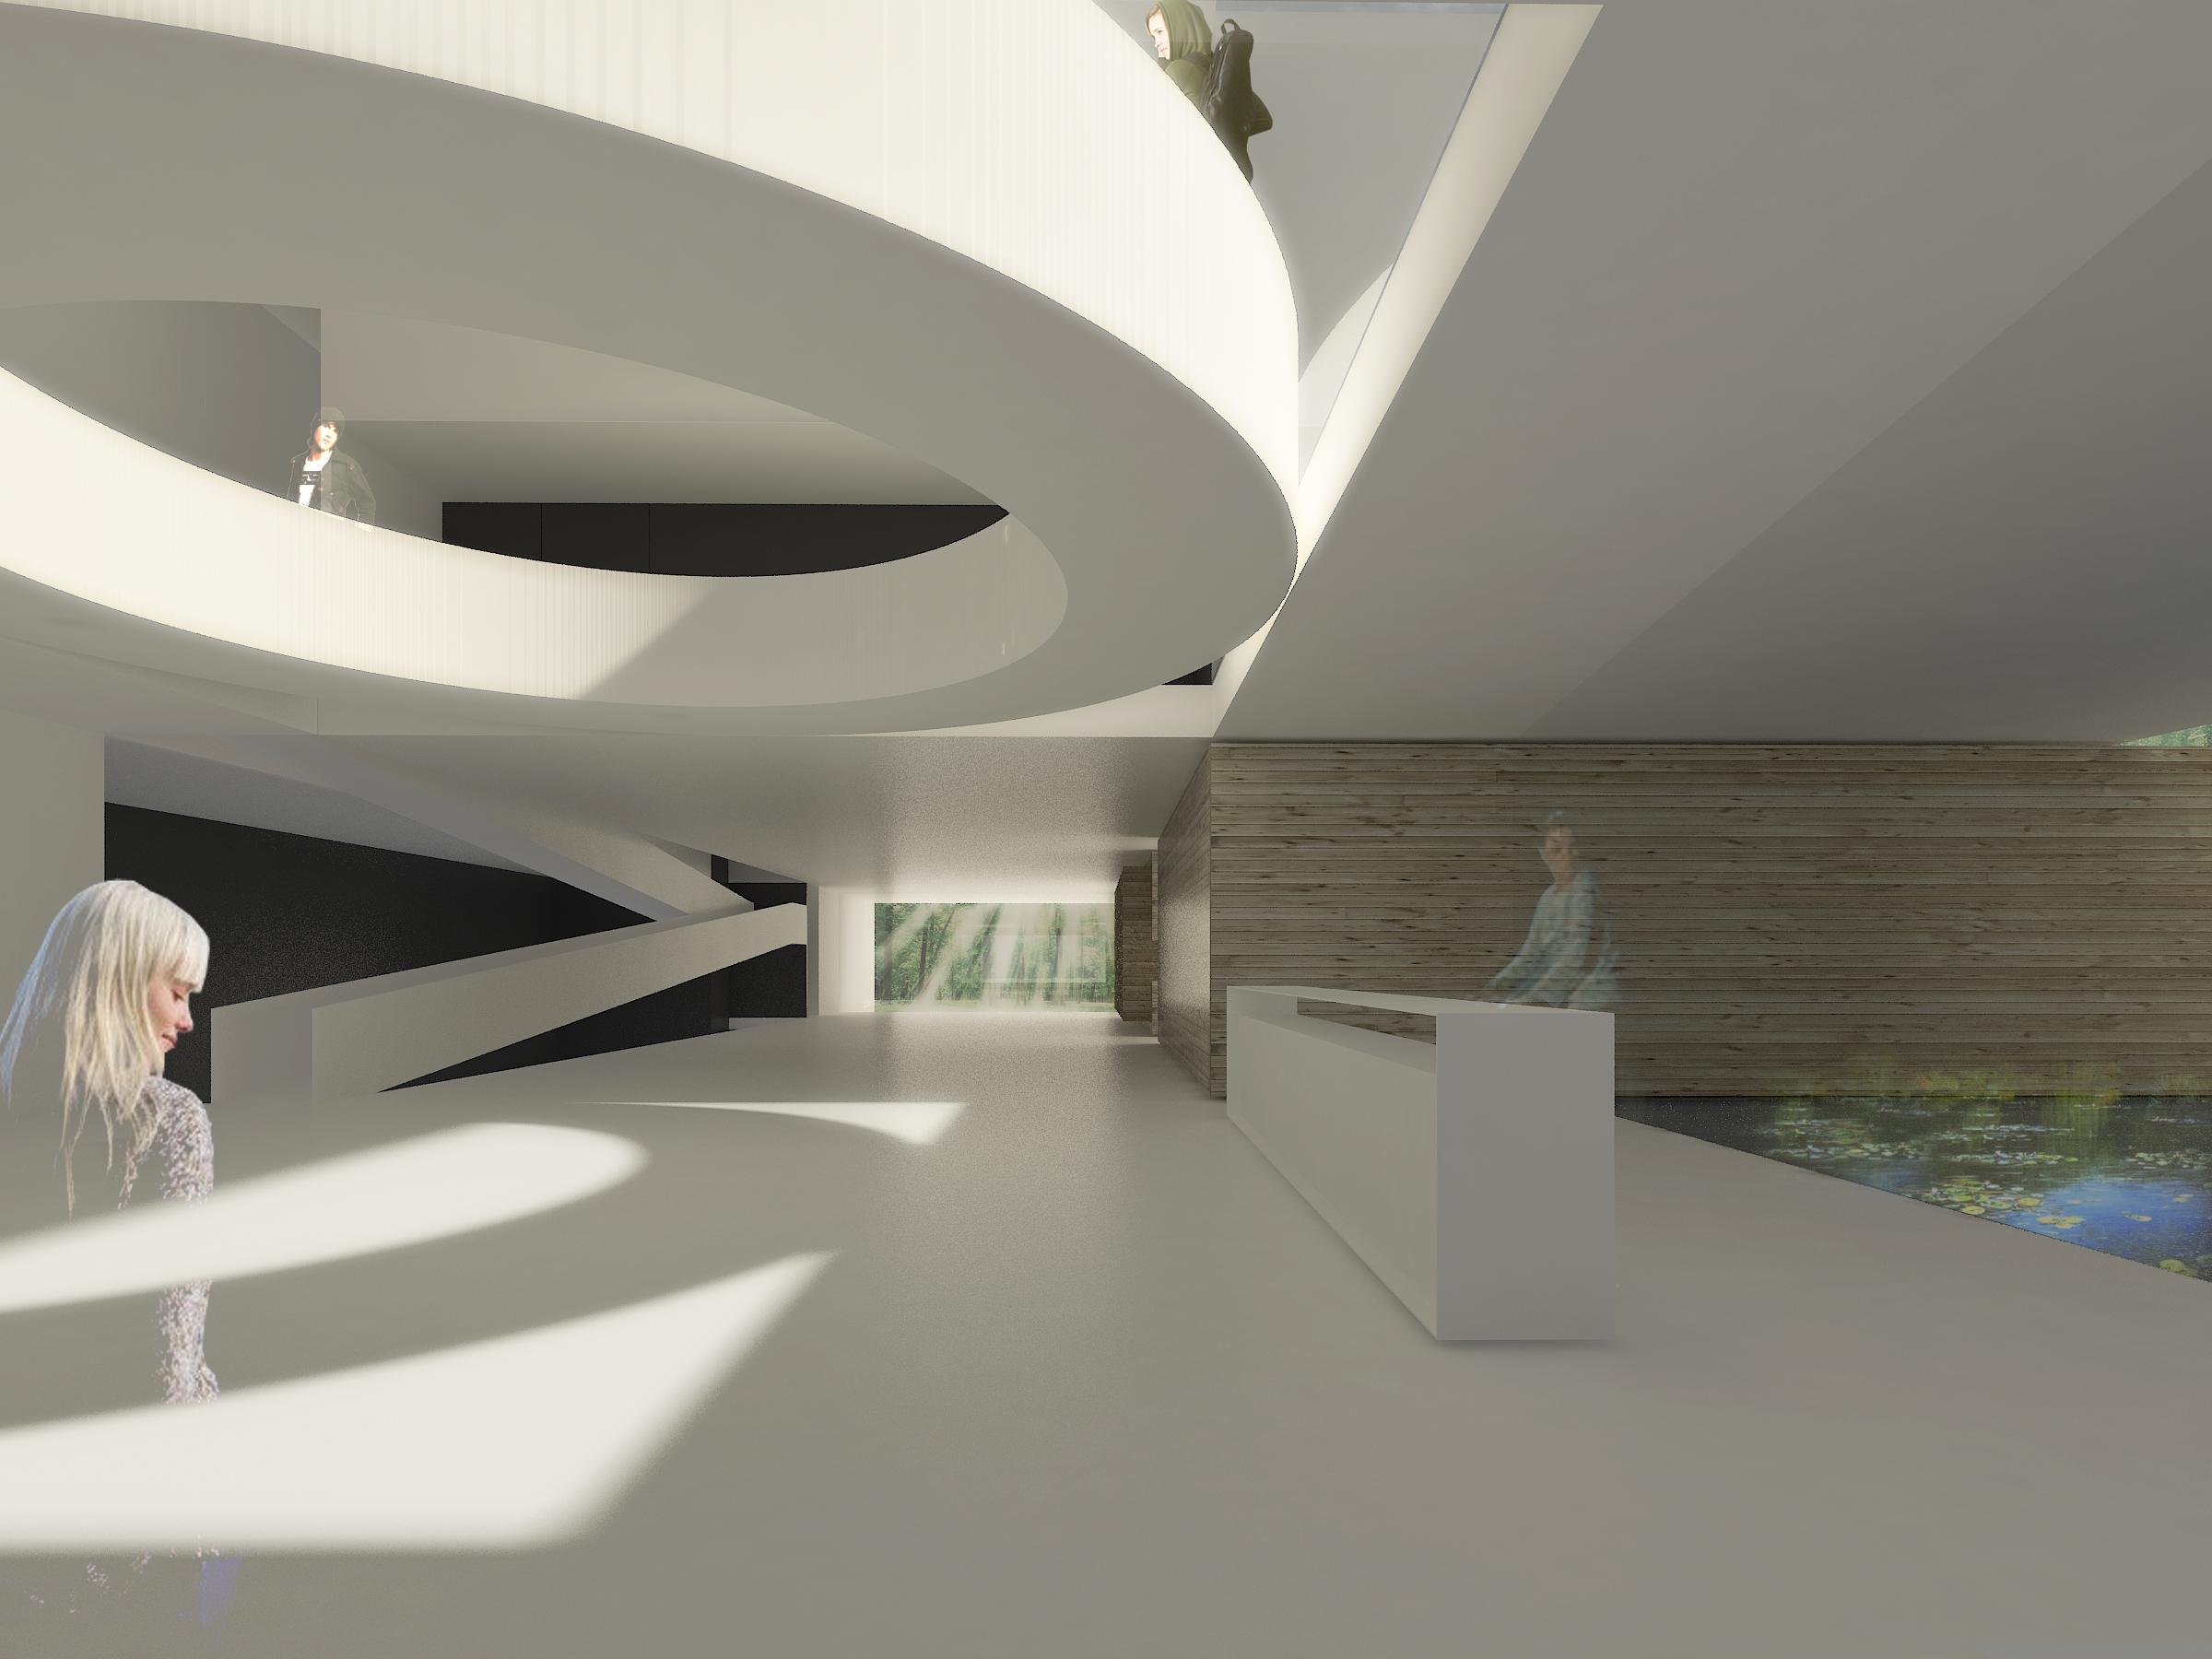 planell-hirsch_concurso_arquitectura_calvia 02